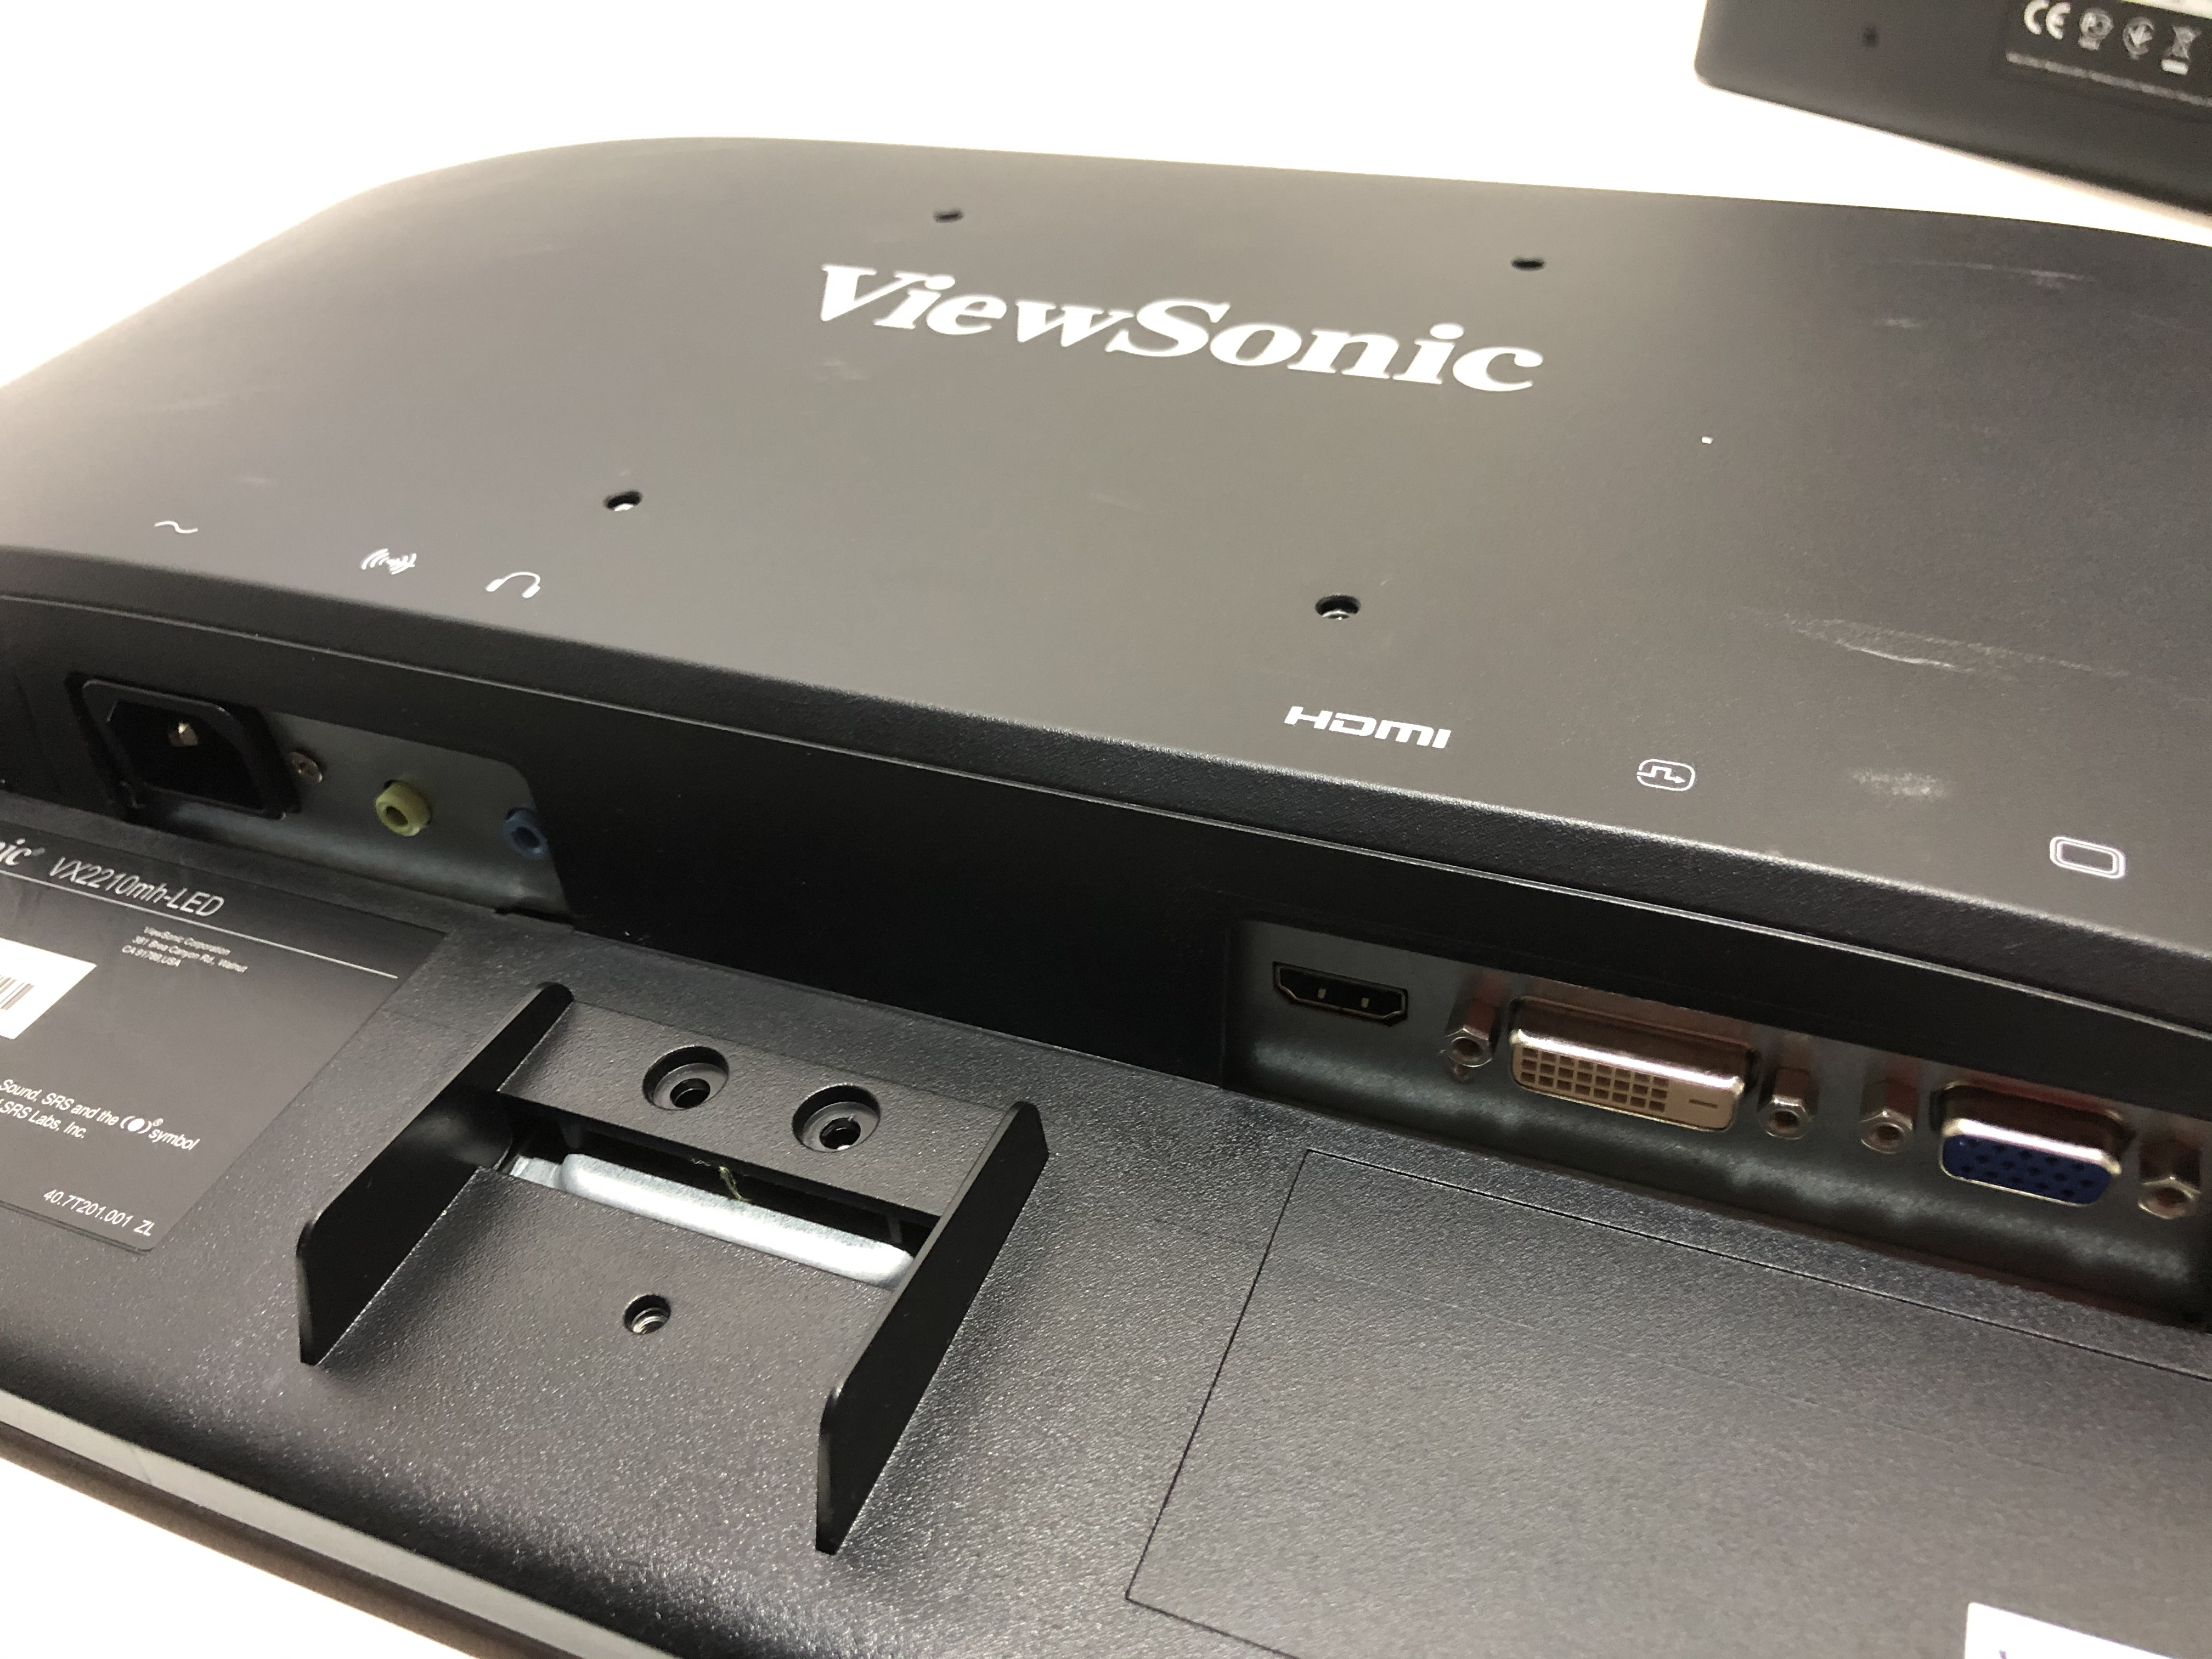 Viewsonic VX2210MH-LED No 5